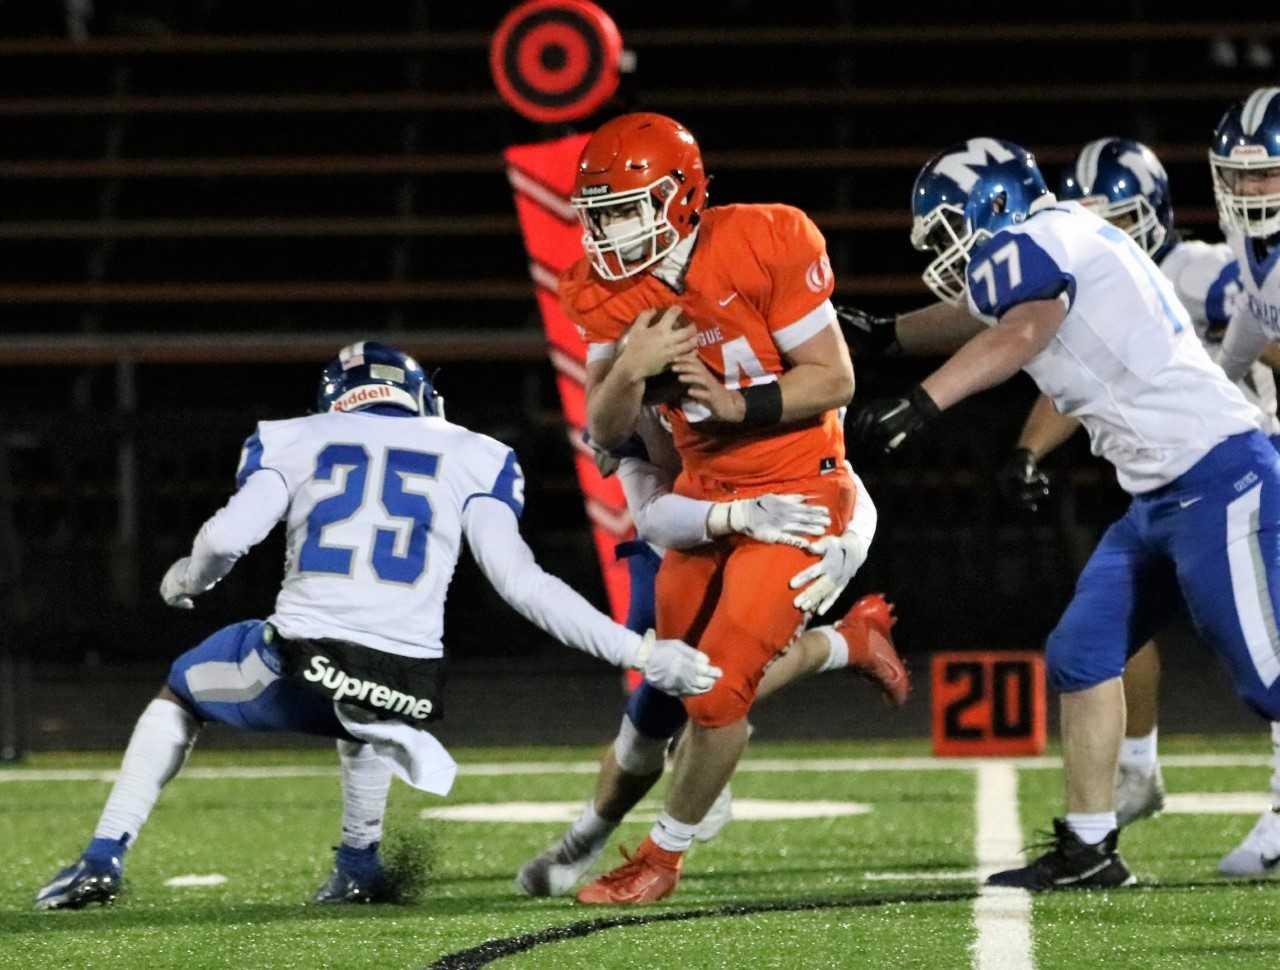 Sprague senior Ethan Bullock ran for three touchdowns in a 28-0 win over McNary on Friday. (Photo by Steve Polanski)